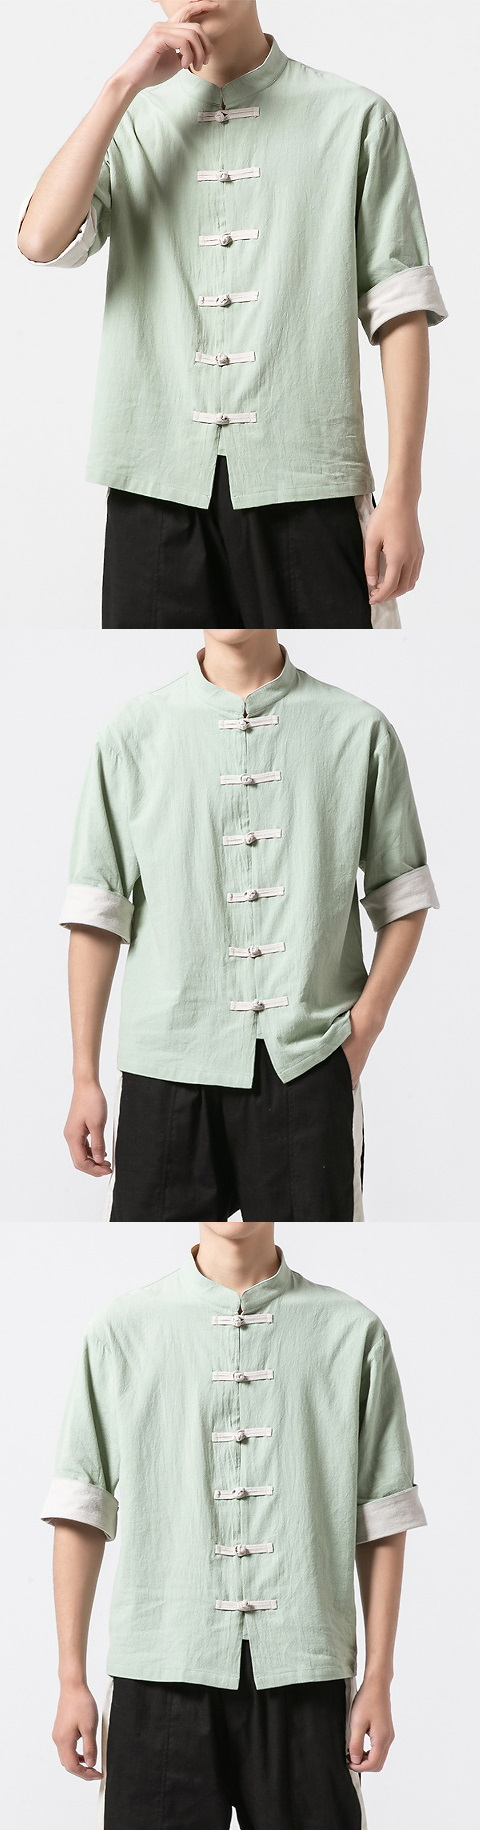 Chic Mandarin Elbow-length Folding-sleeve Cotton Shirt (RM/CM)